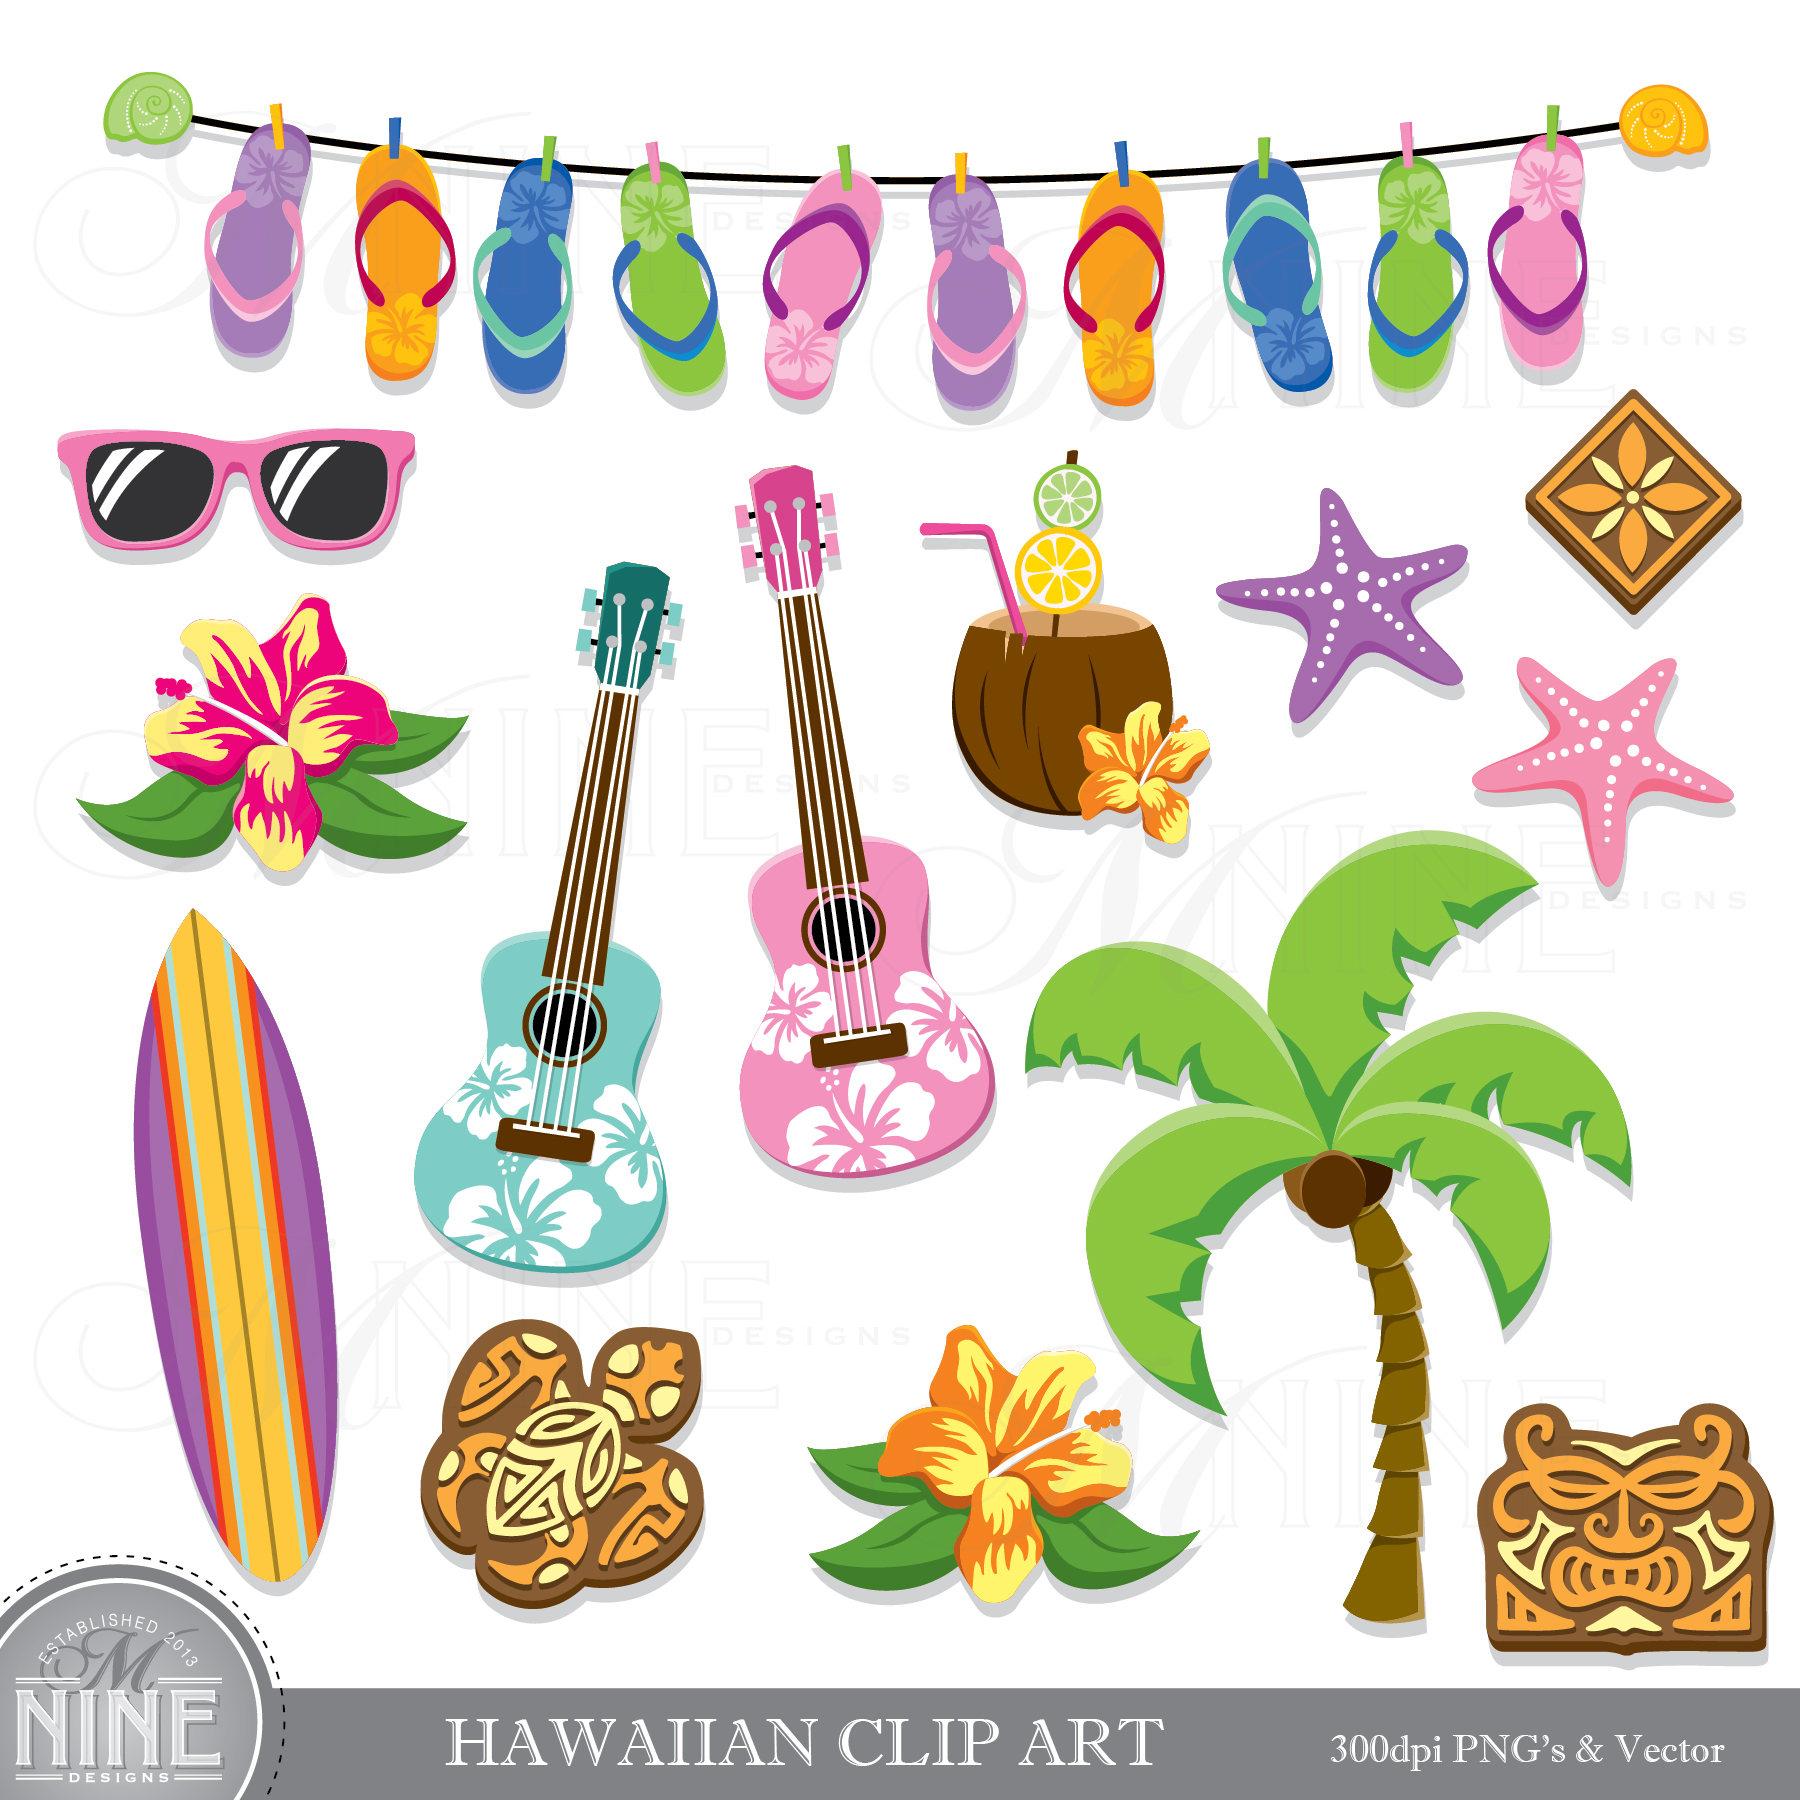 HAWAIIAN ClipArt / Hawaii Thema Cliparts Downloads / Luau Clip